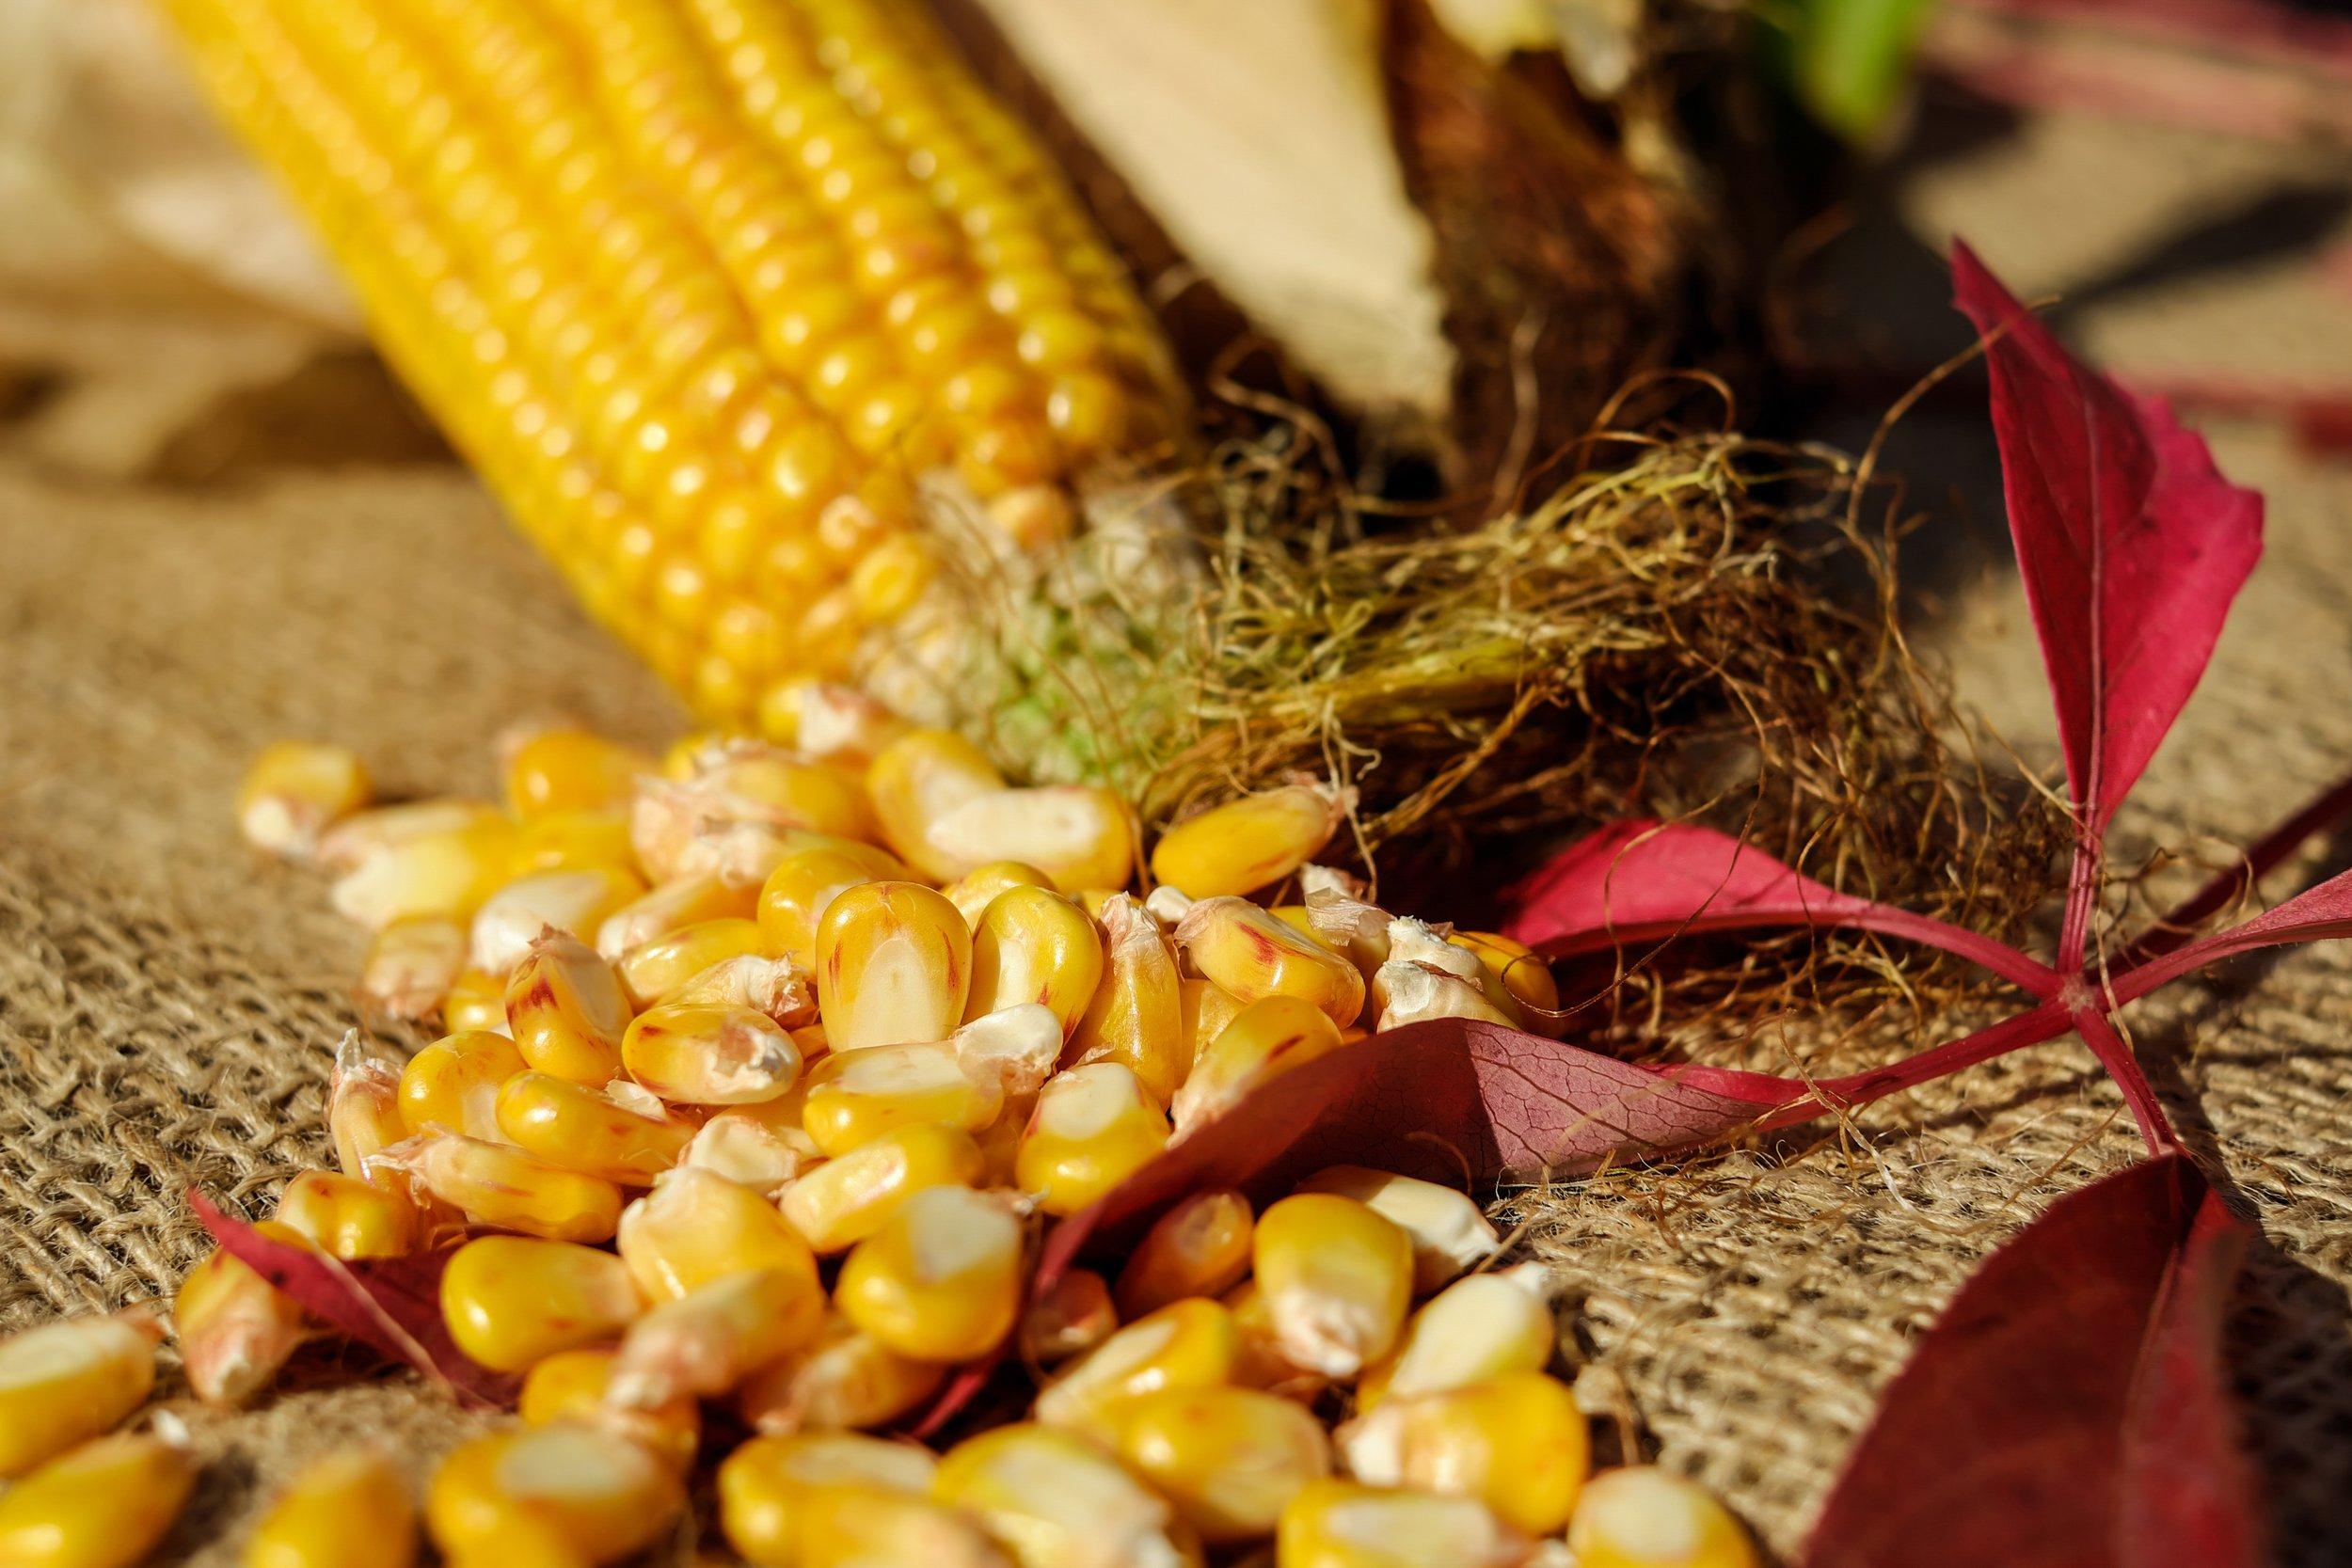 close-up-corn-corn-kernels-209389.jpg